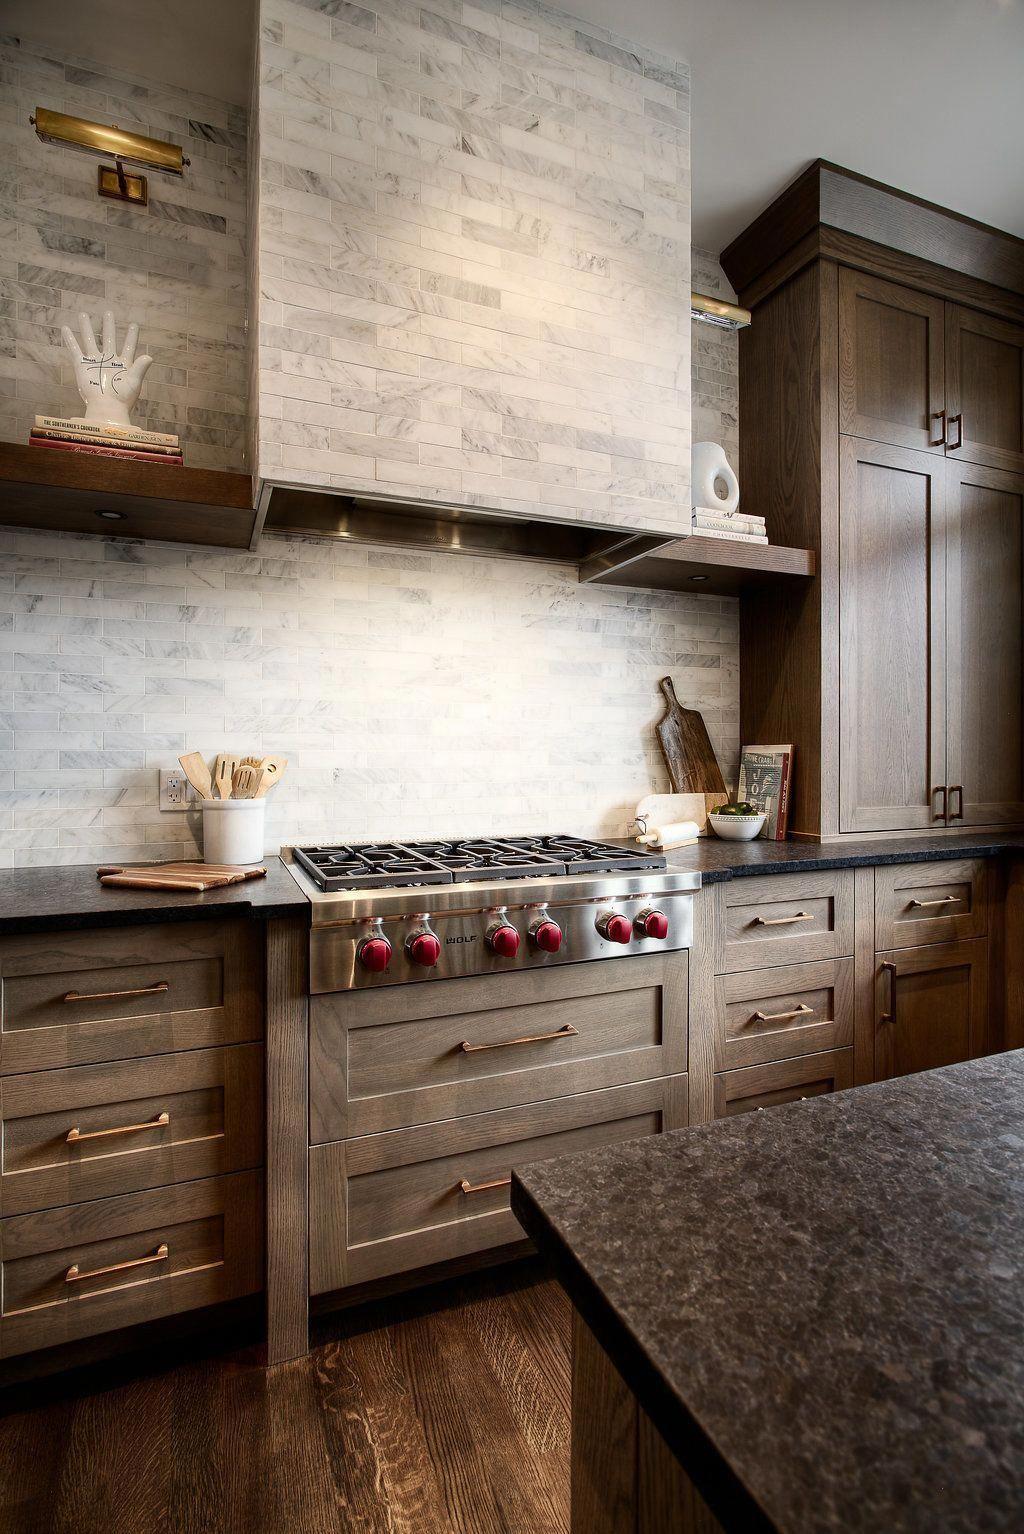 Best Rustic Kitchen Remodel Ideas Farmhouse Chic Kitchen 400 x 300